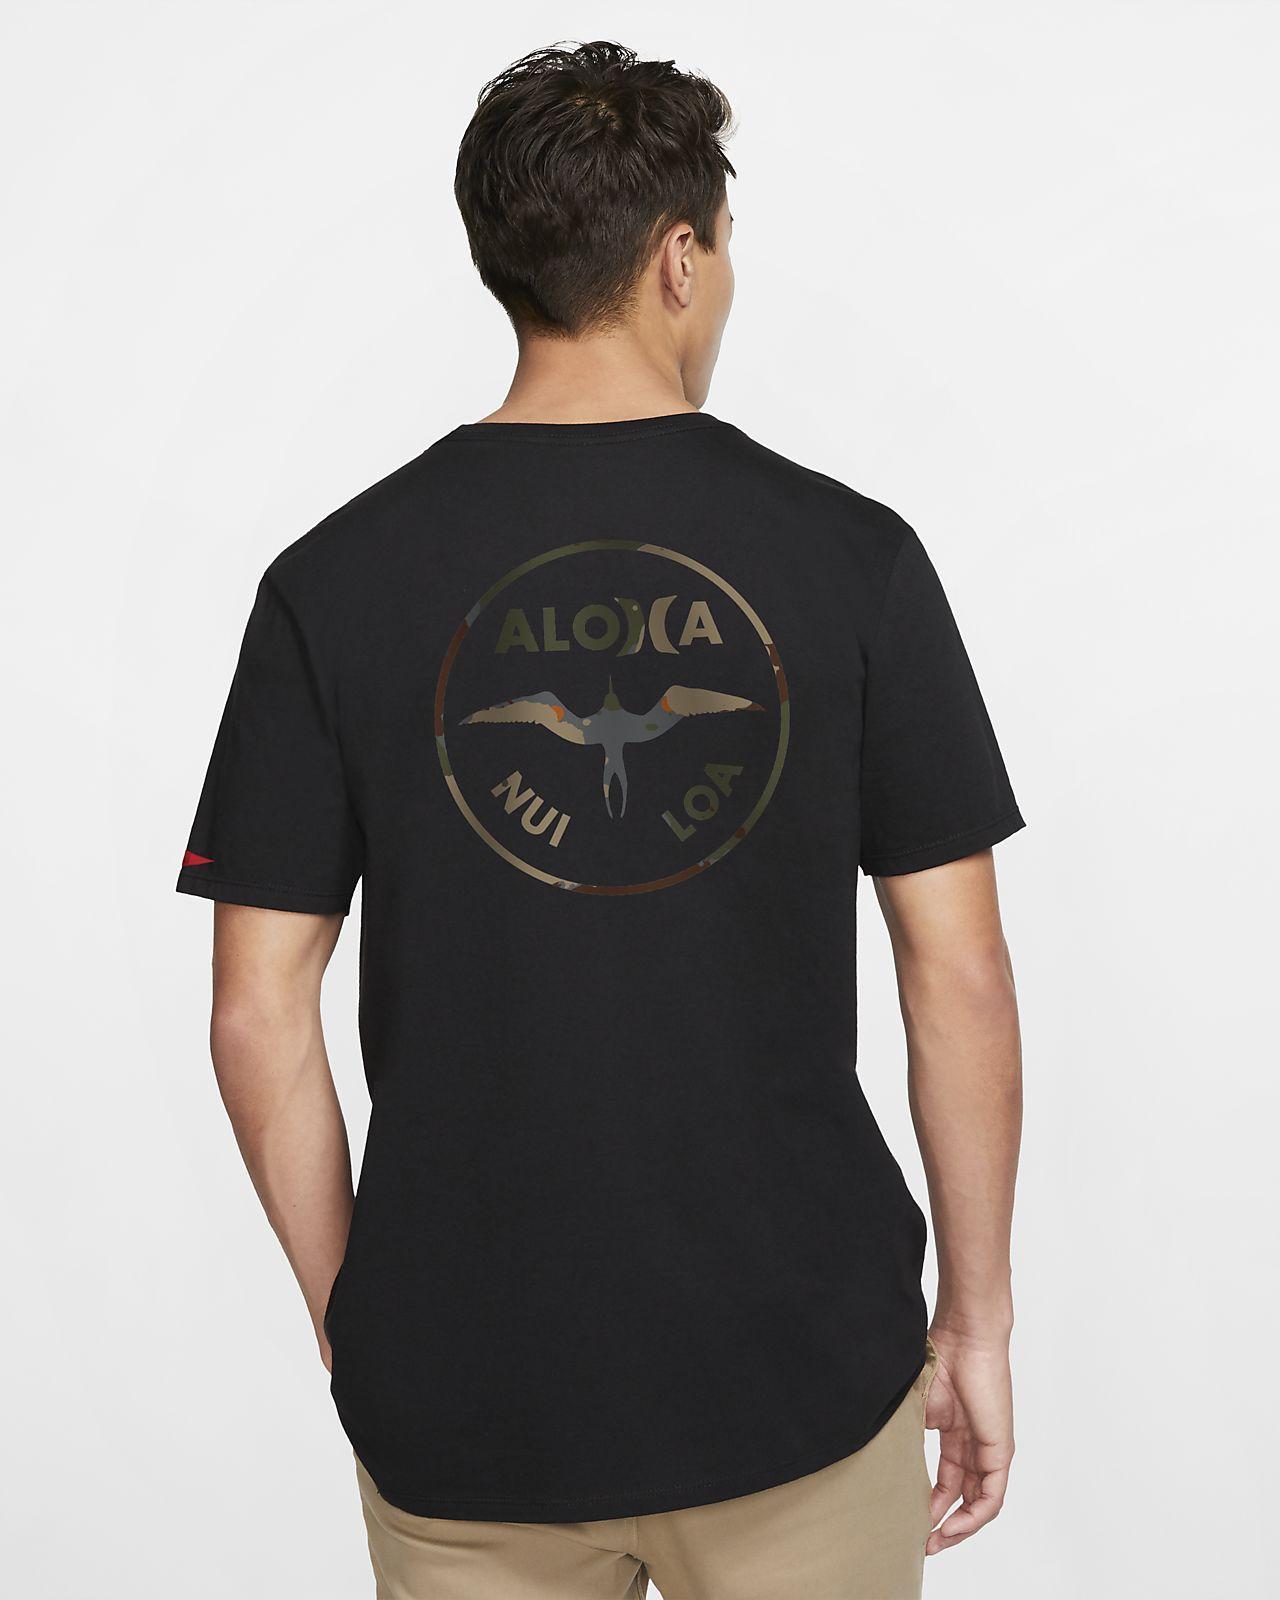 Tee-shirt Hurley Premium JJF Aloha pour Homme